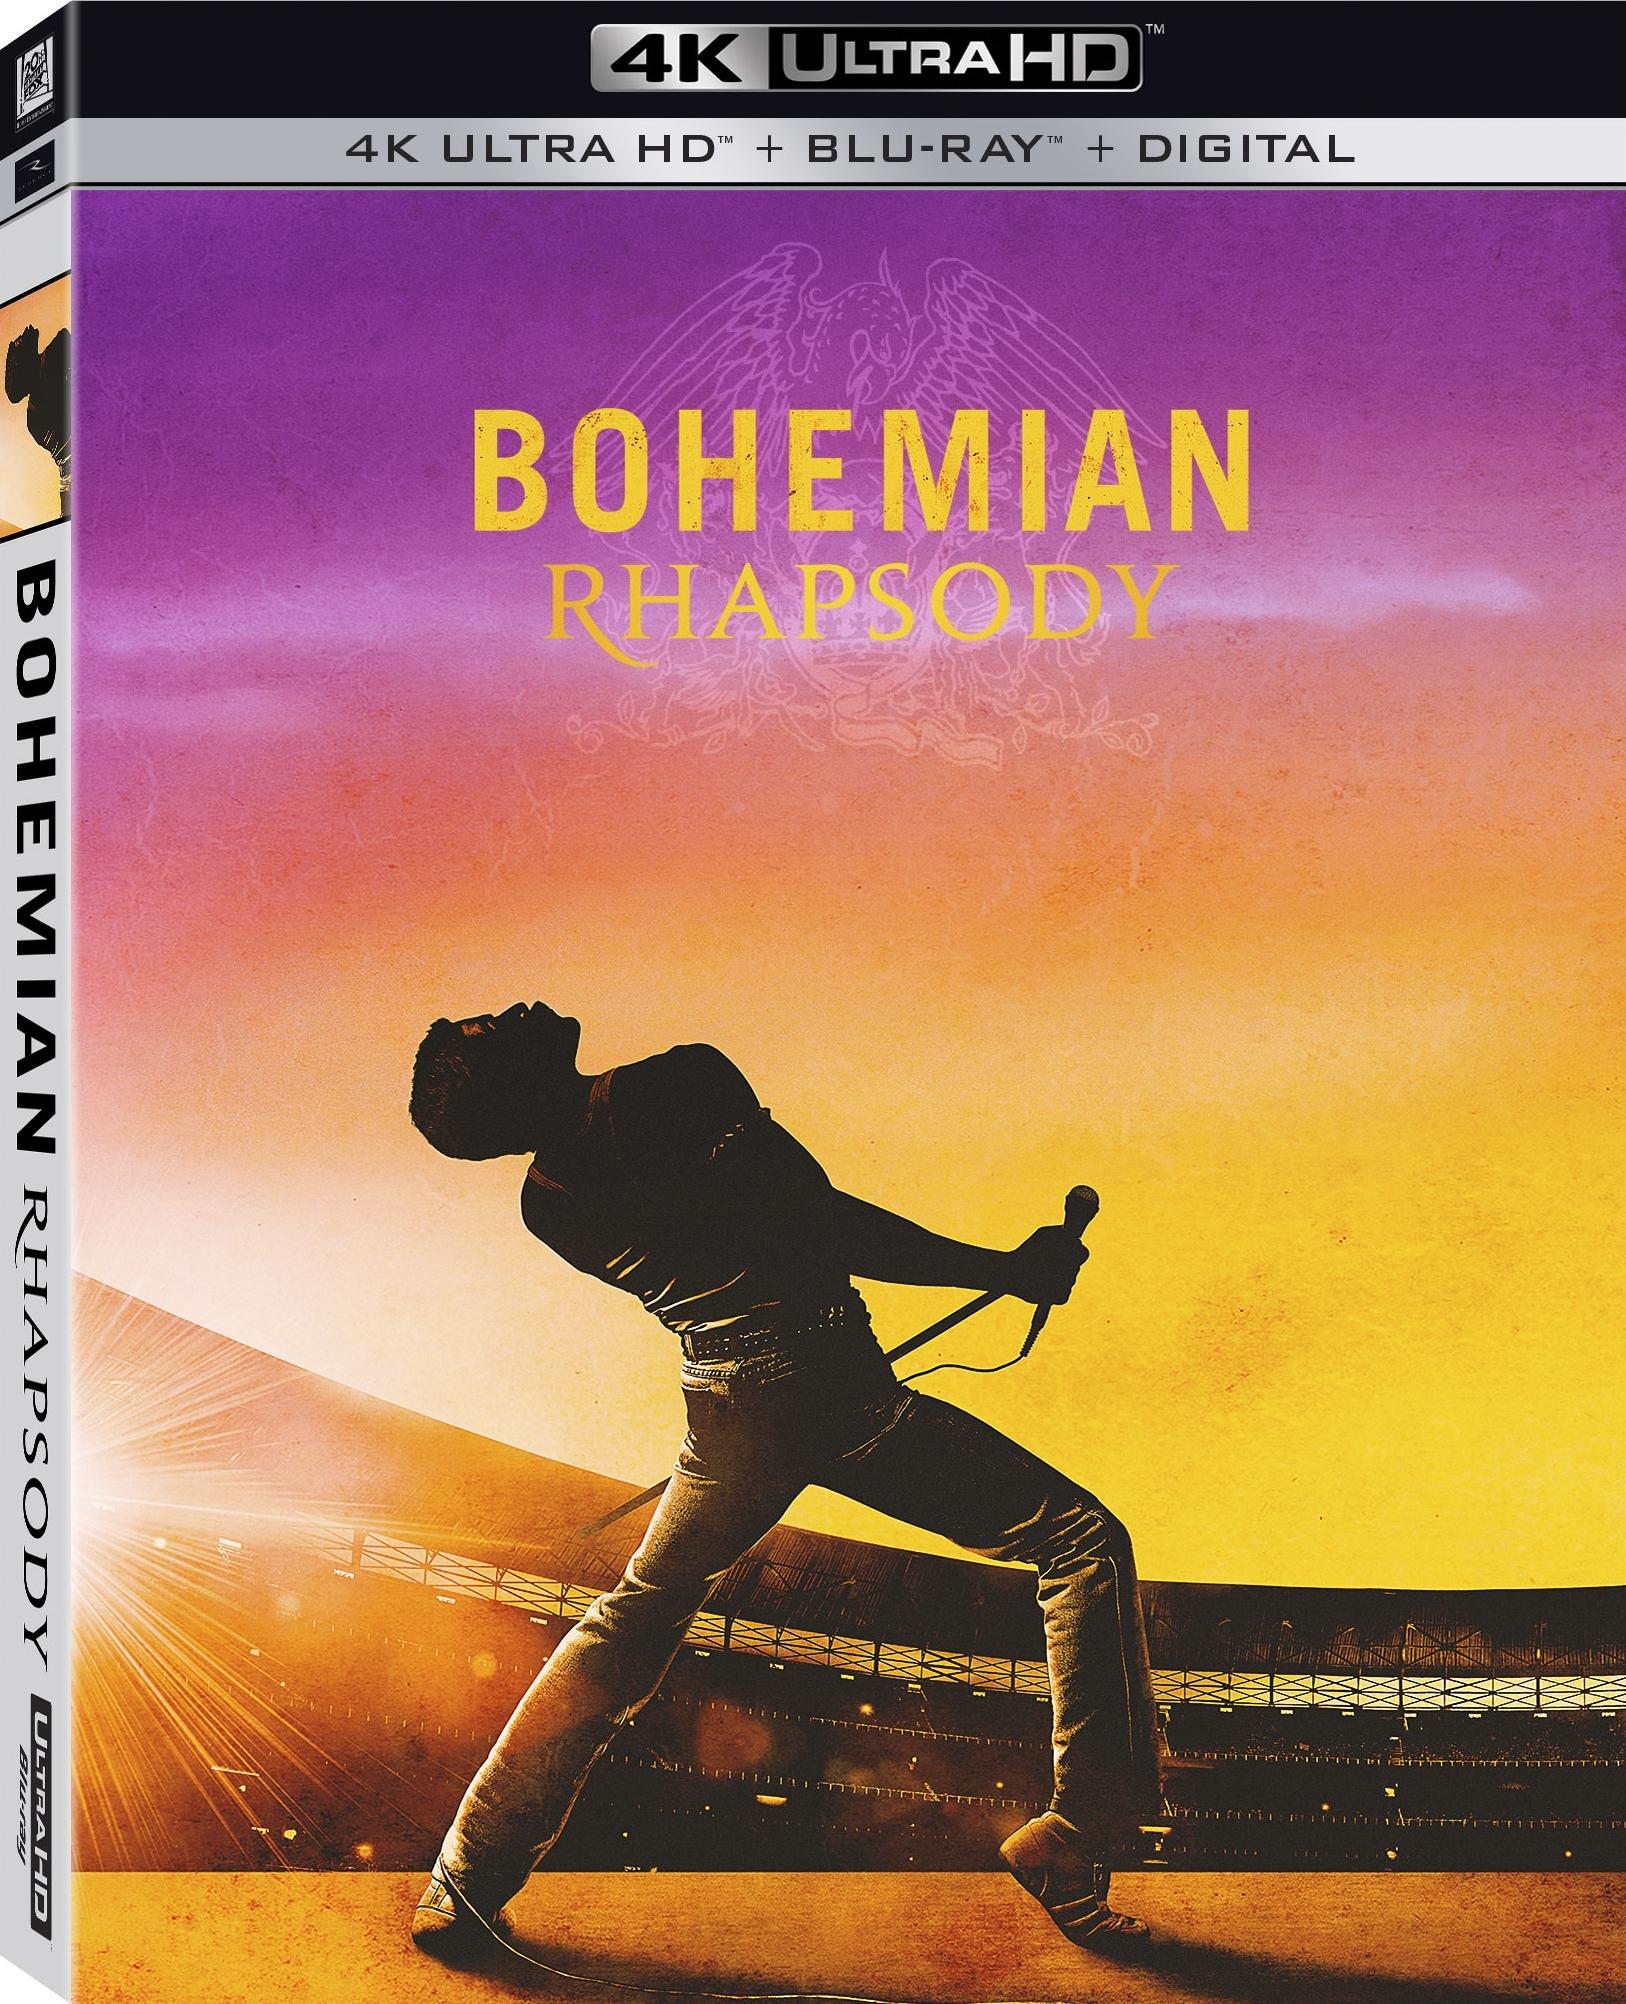 Bohemian Rhapsody (4K Ultra HD Blu-ray)(Pre-order / TBA)